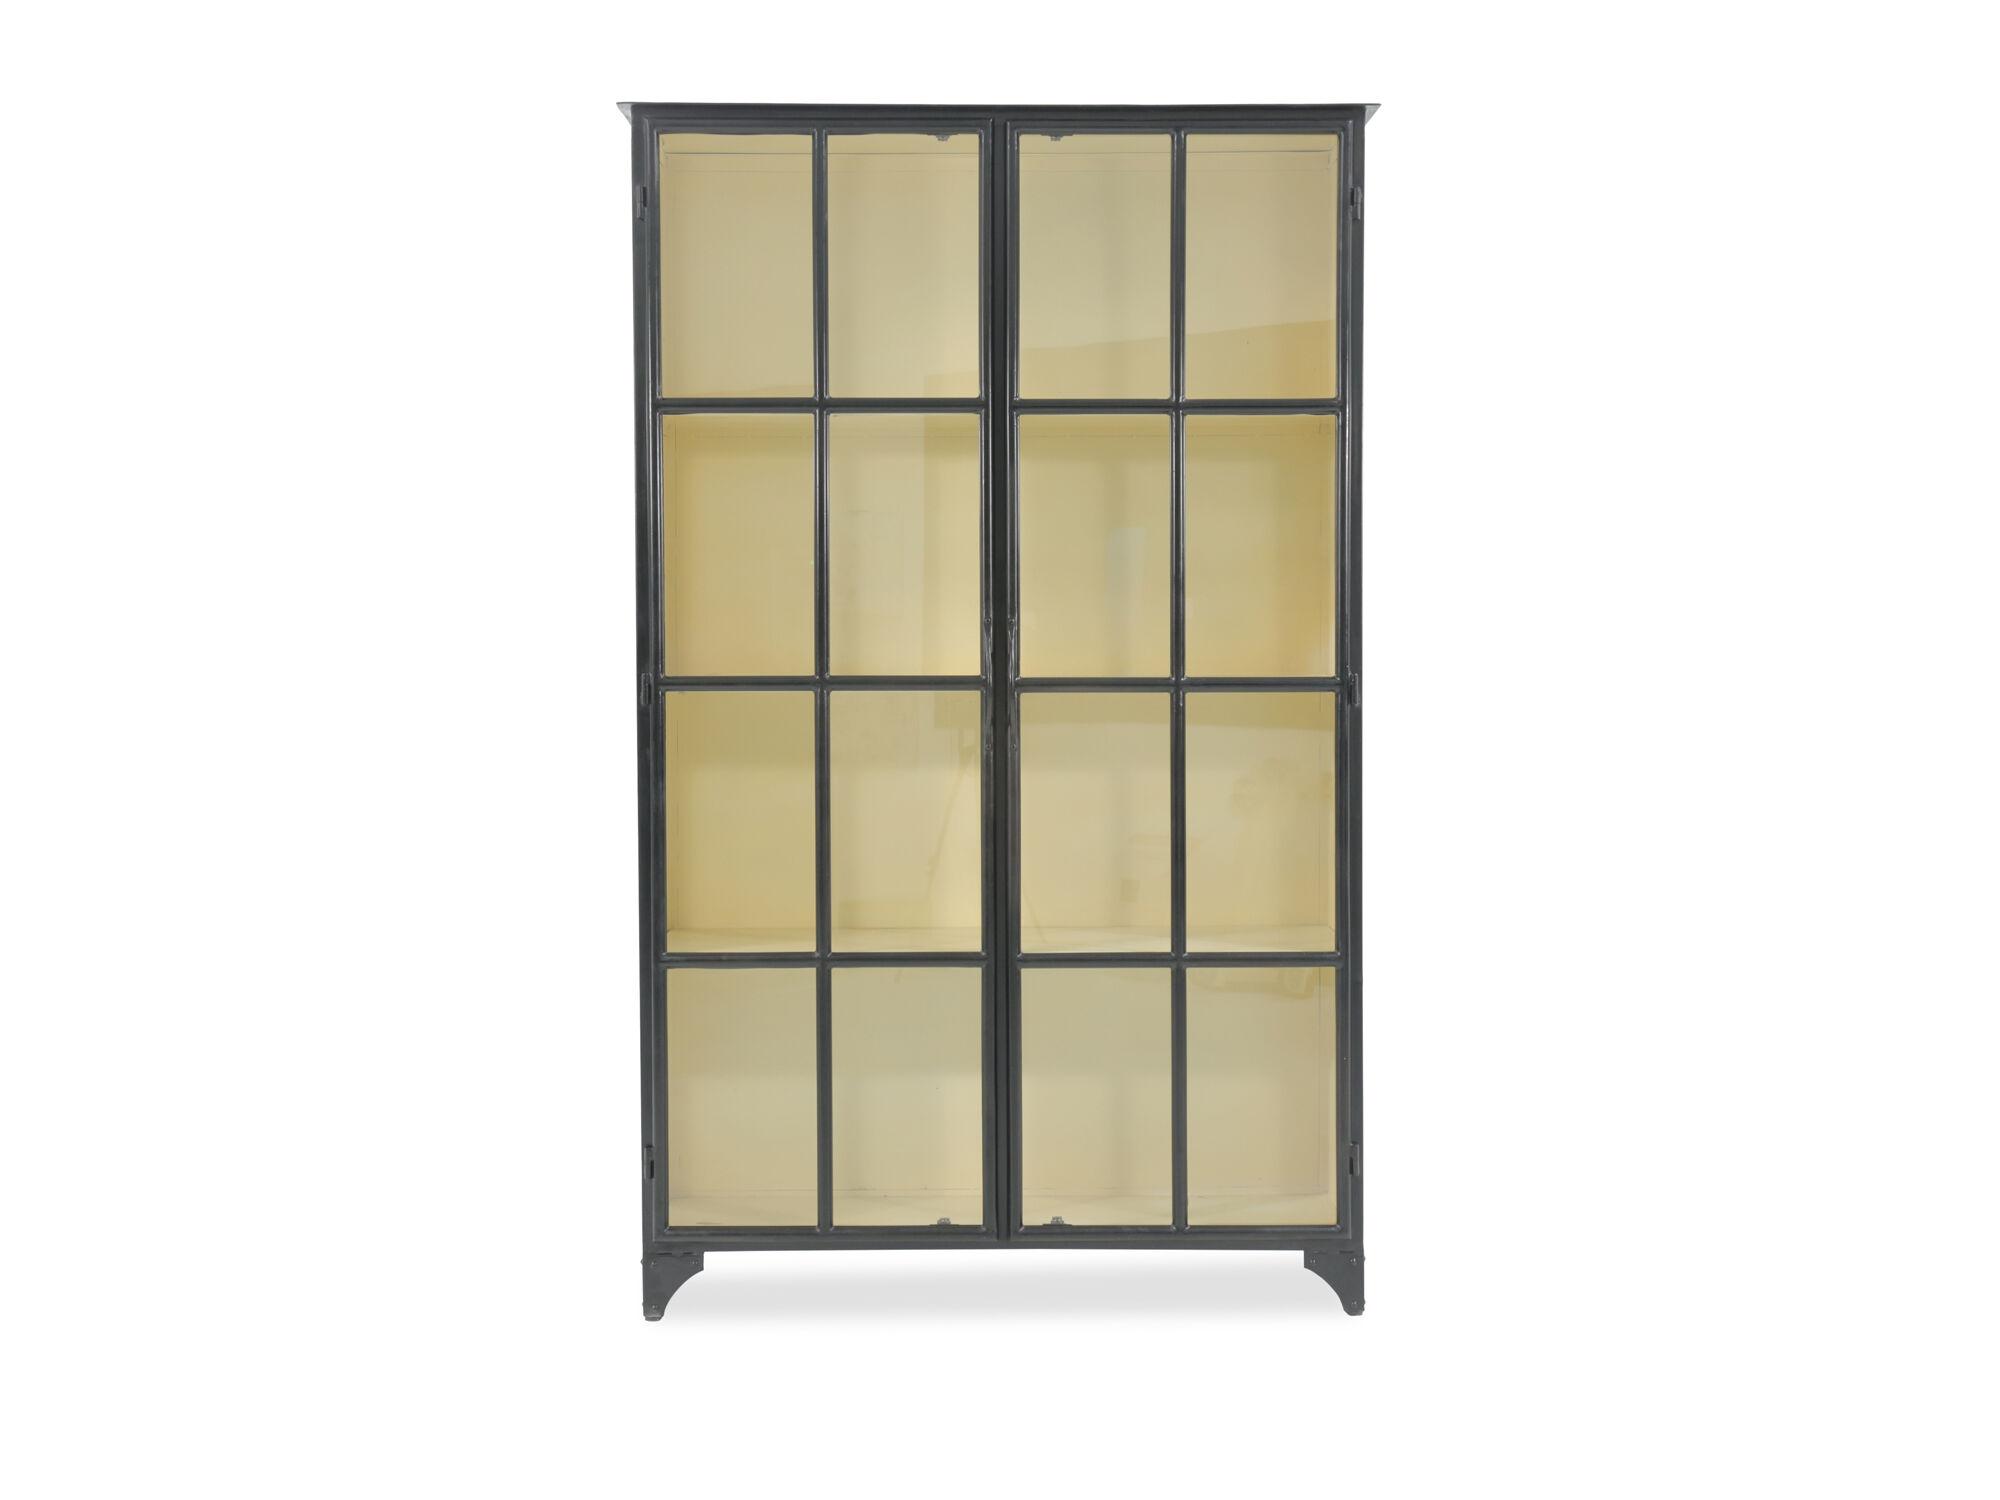 Images Transitional Framed Glass Door Display Cabinet In Matte Black  Transitional Framed Glass Door Display Cabinet In Matte Black